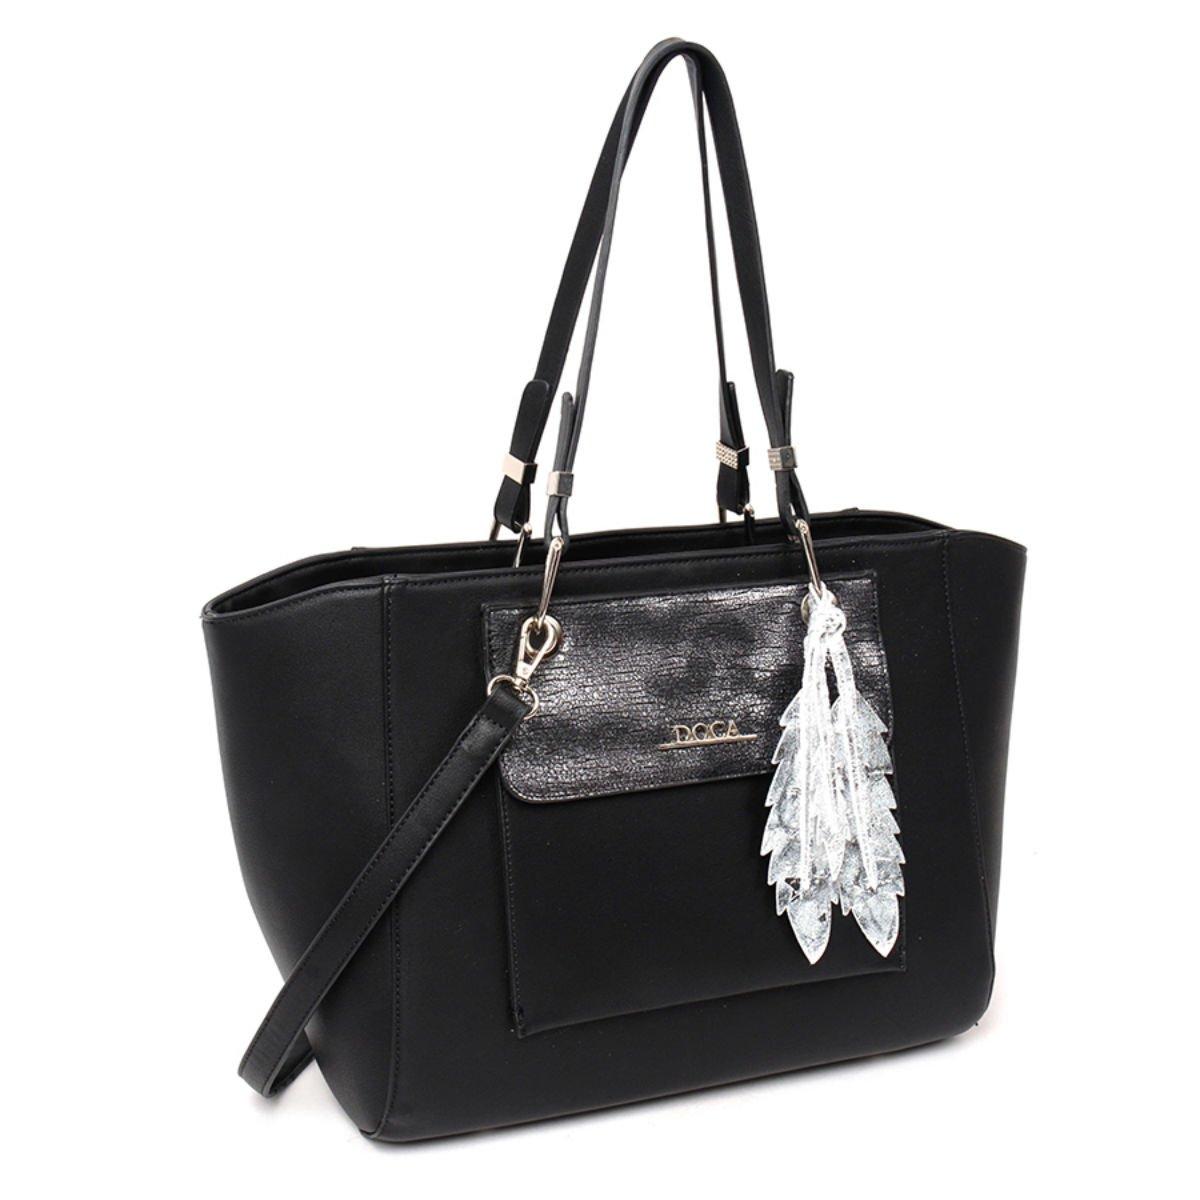 Černá lesklá kabelka DOCA - Feather